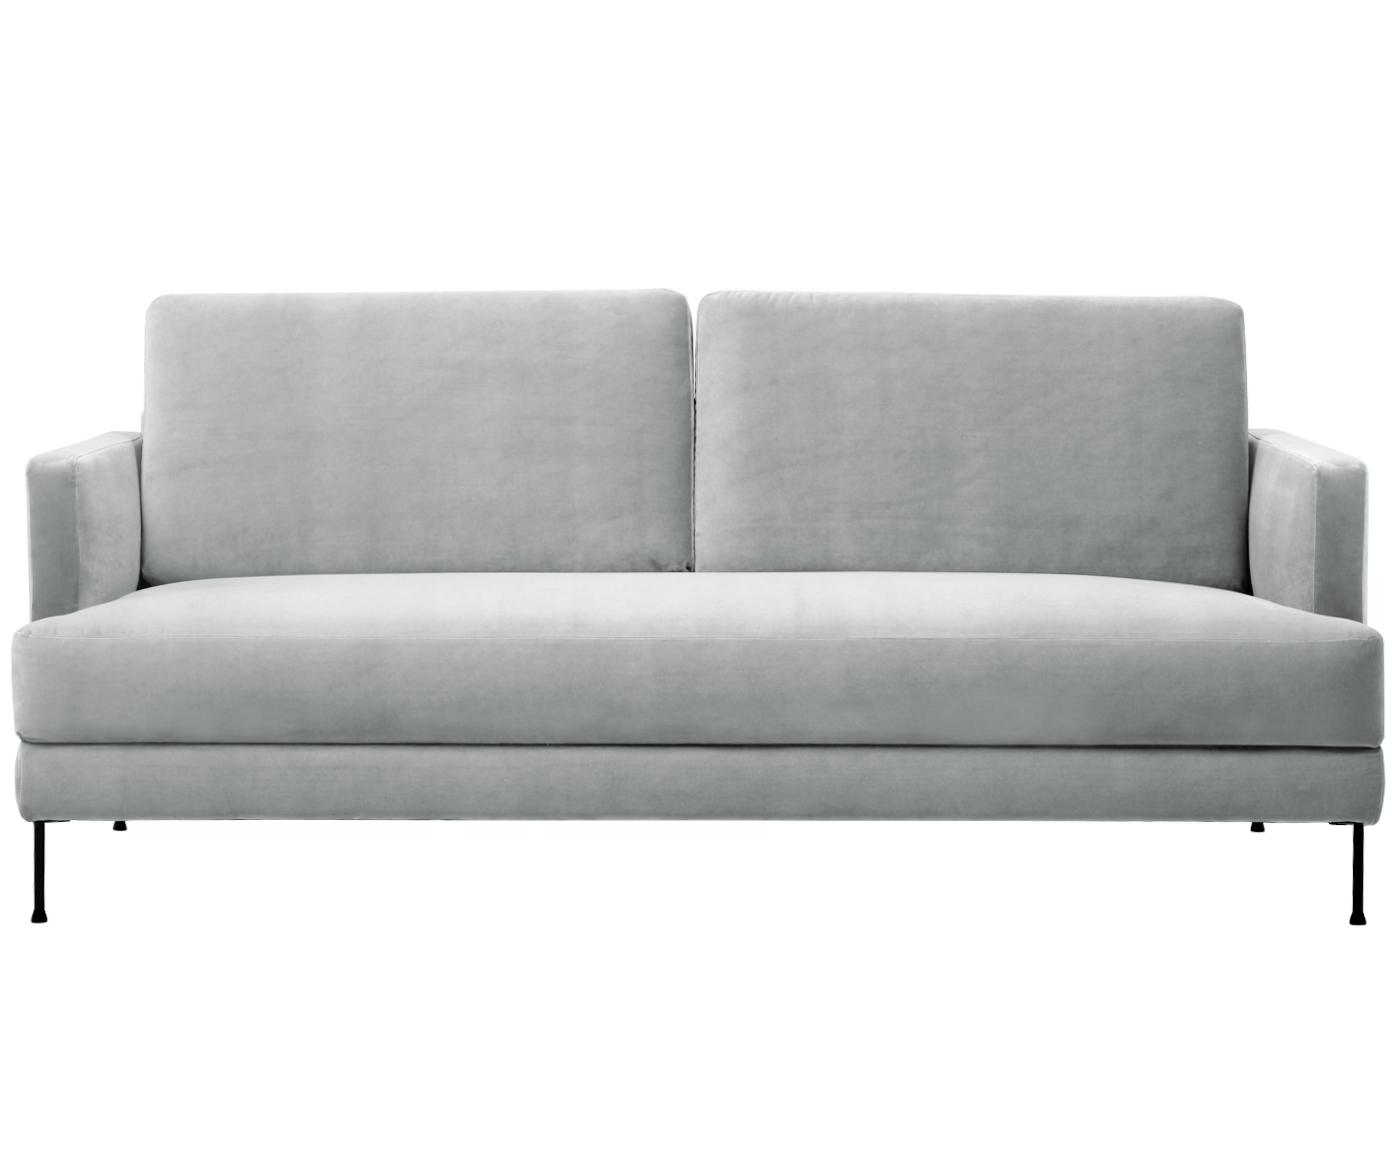 Stoff Sofa Reinigen Geruch - Caseconrad.com